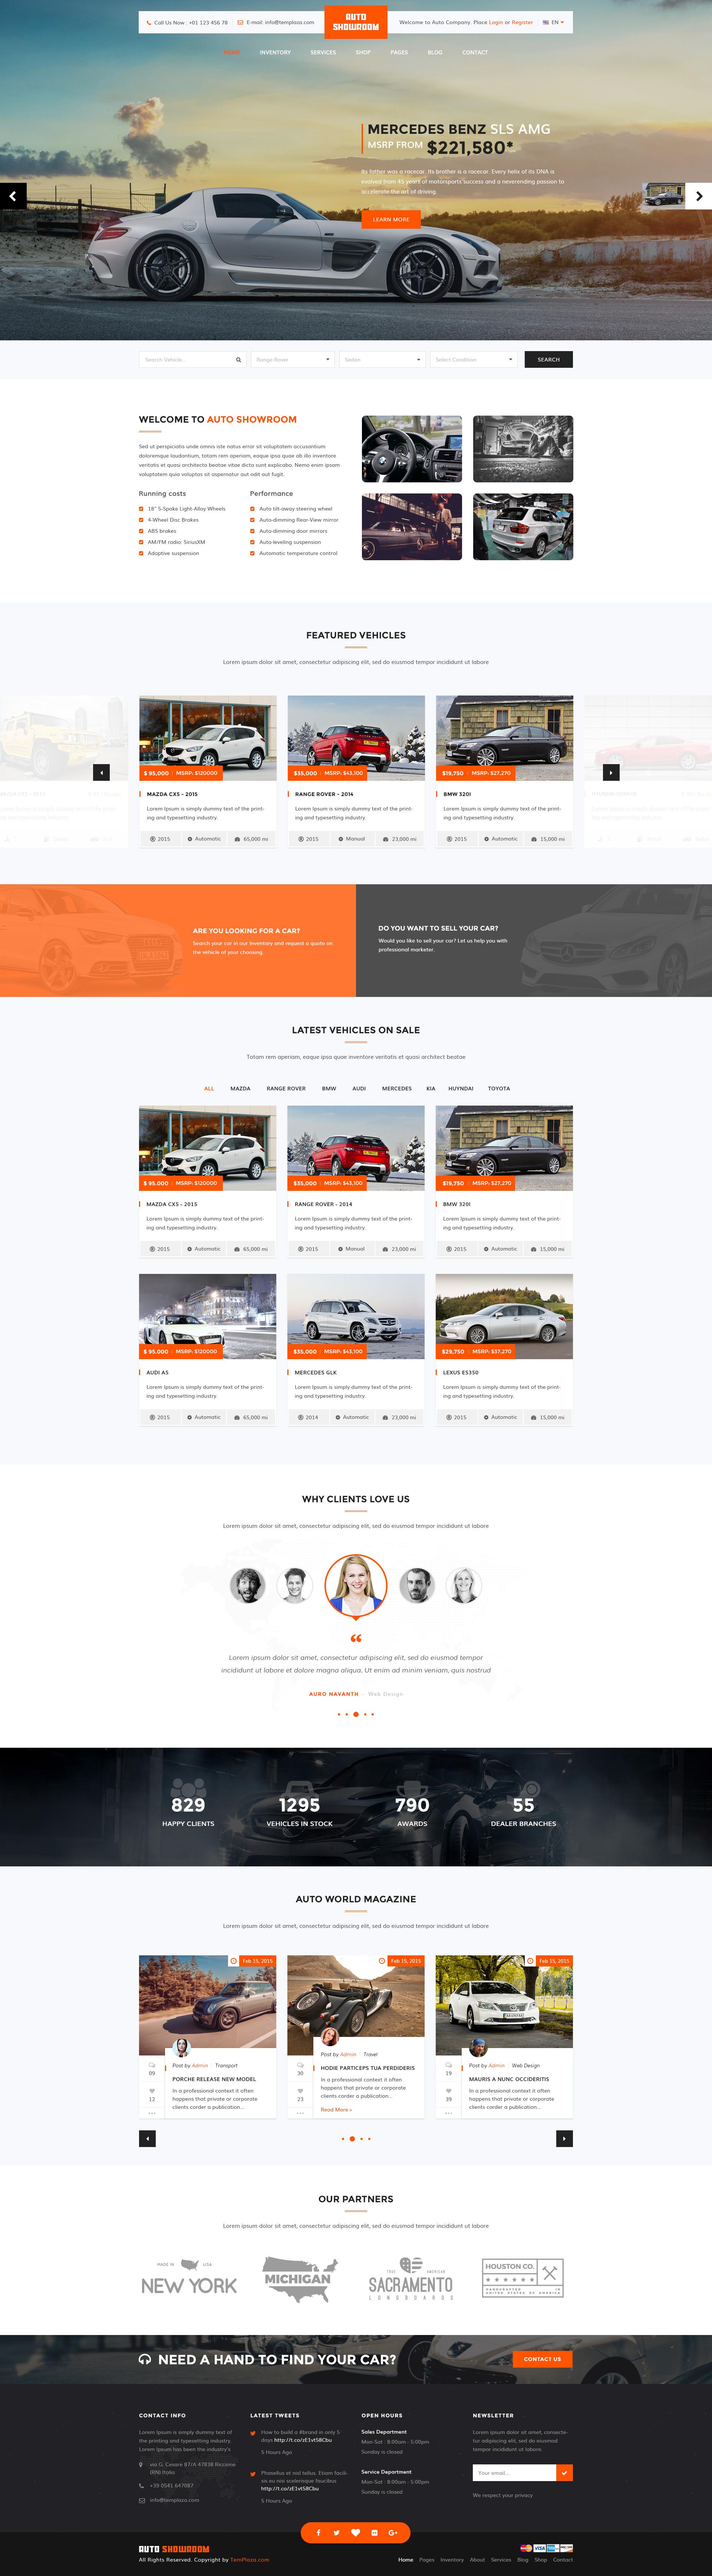 Car Salesman's Personal Website Example #2